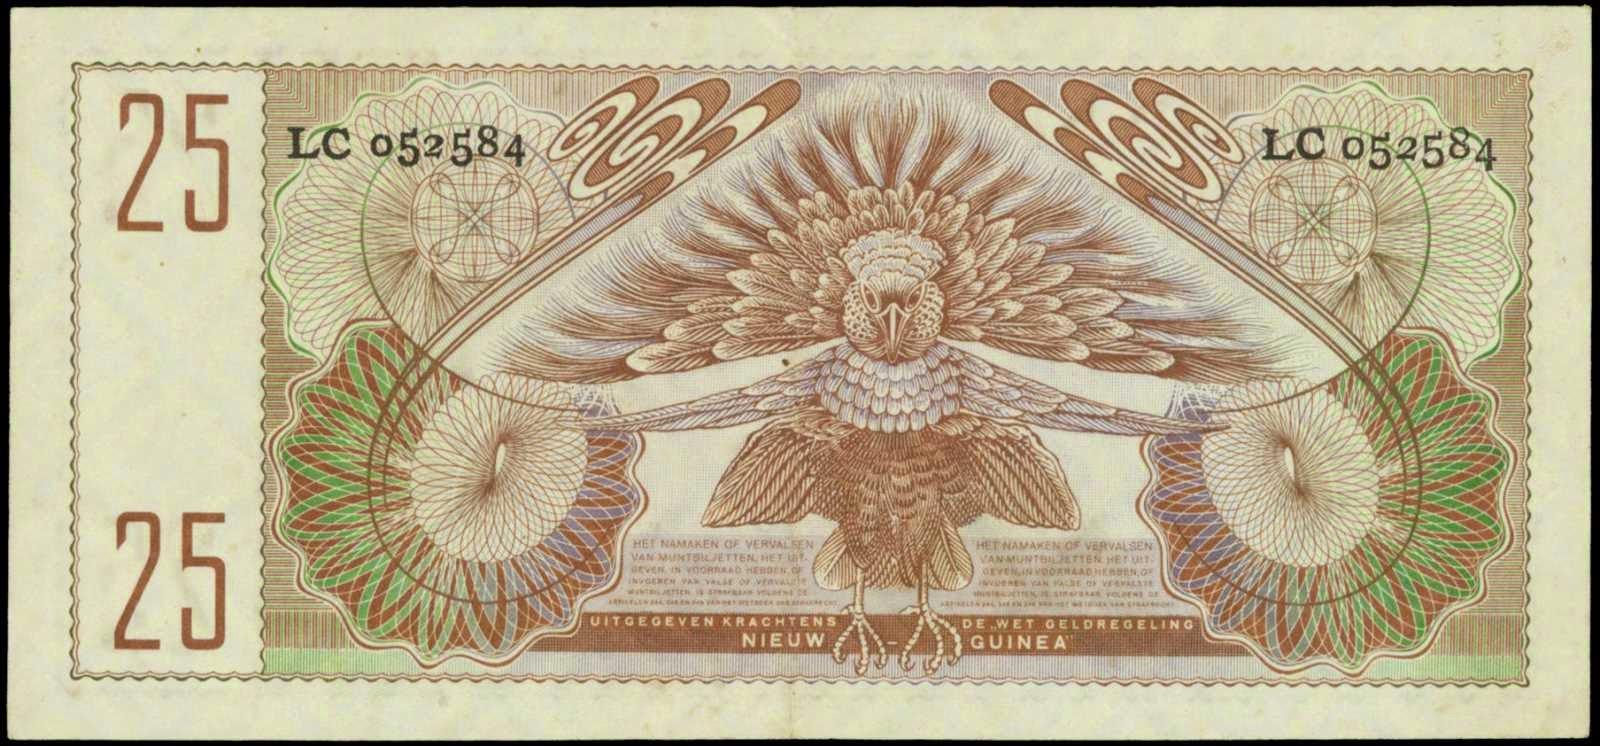 Netherlands New Guinea paper money 25 Gulden bank note 1954